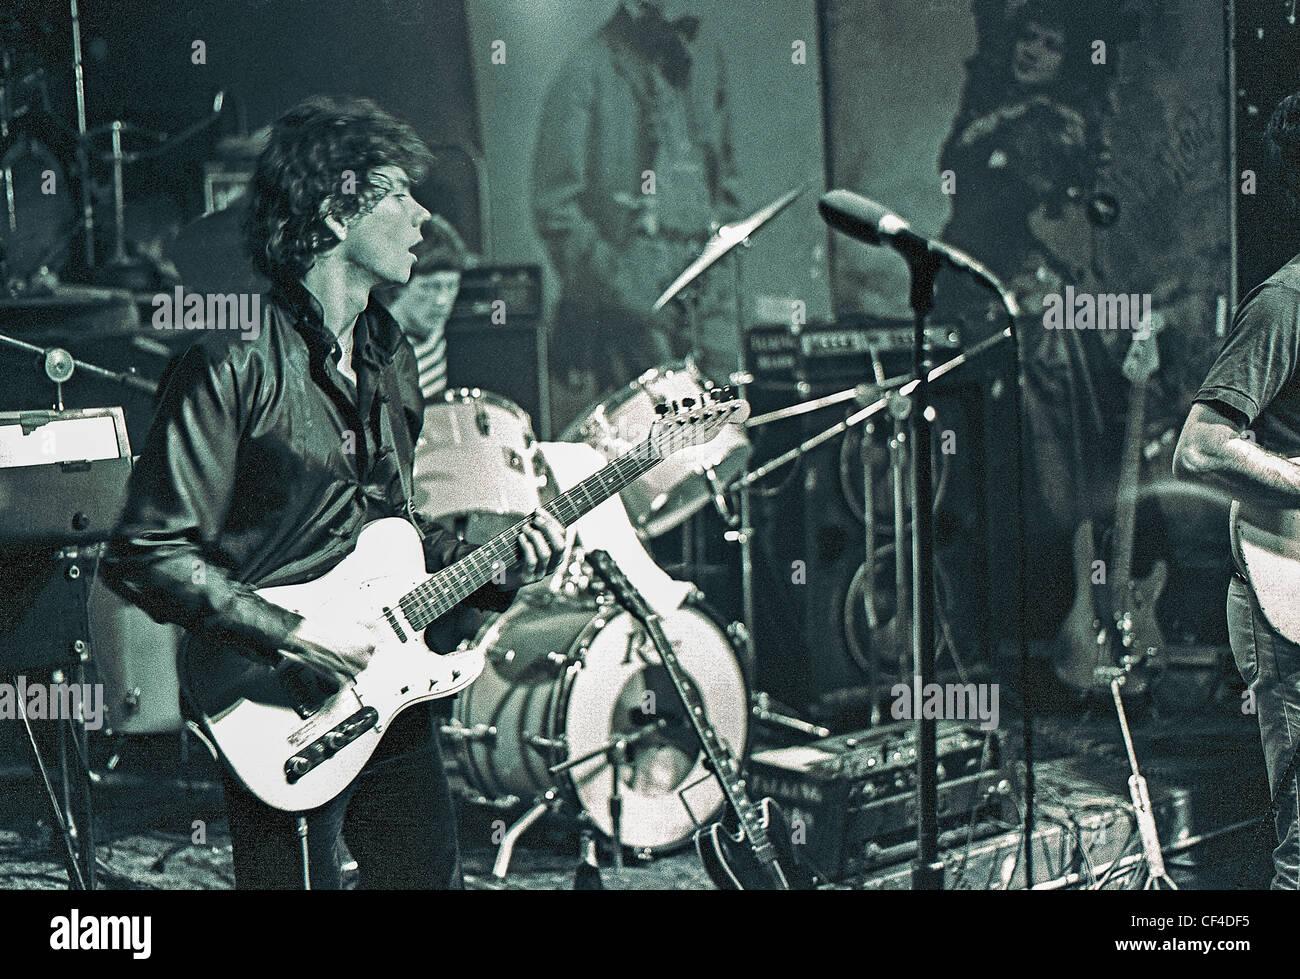 New York, NY, USA - C.B.G.B.'s Nightclub, Interior Scene, with 'The Talking Heads', Guitarist performing - Stock Image